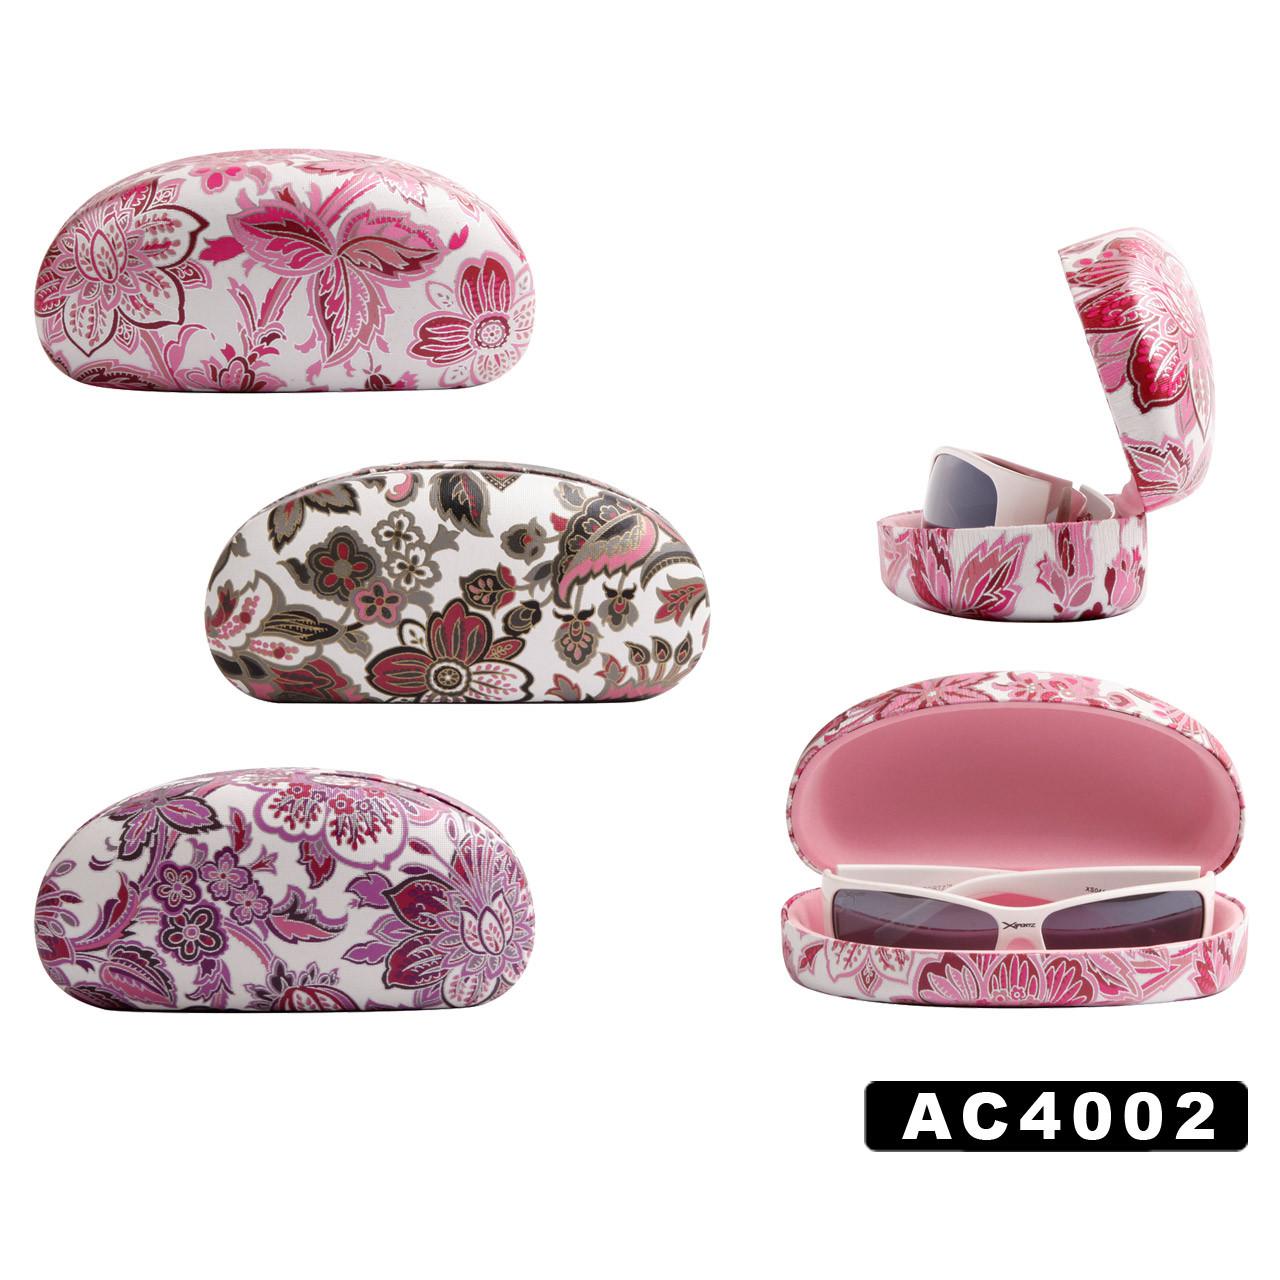 Wholesale Sunglass Hard Cases - AC4002